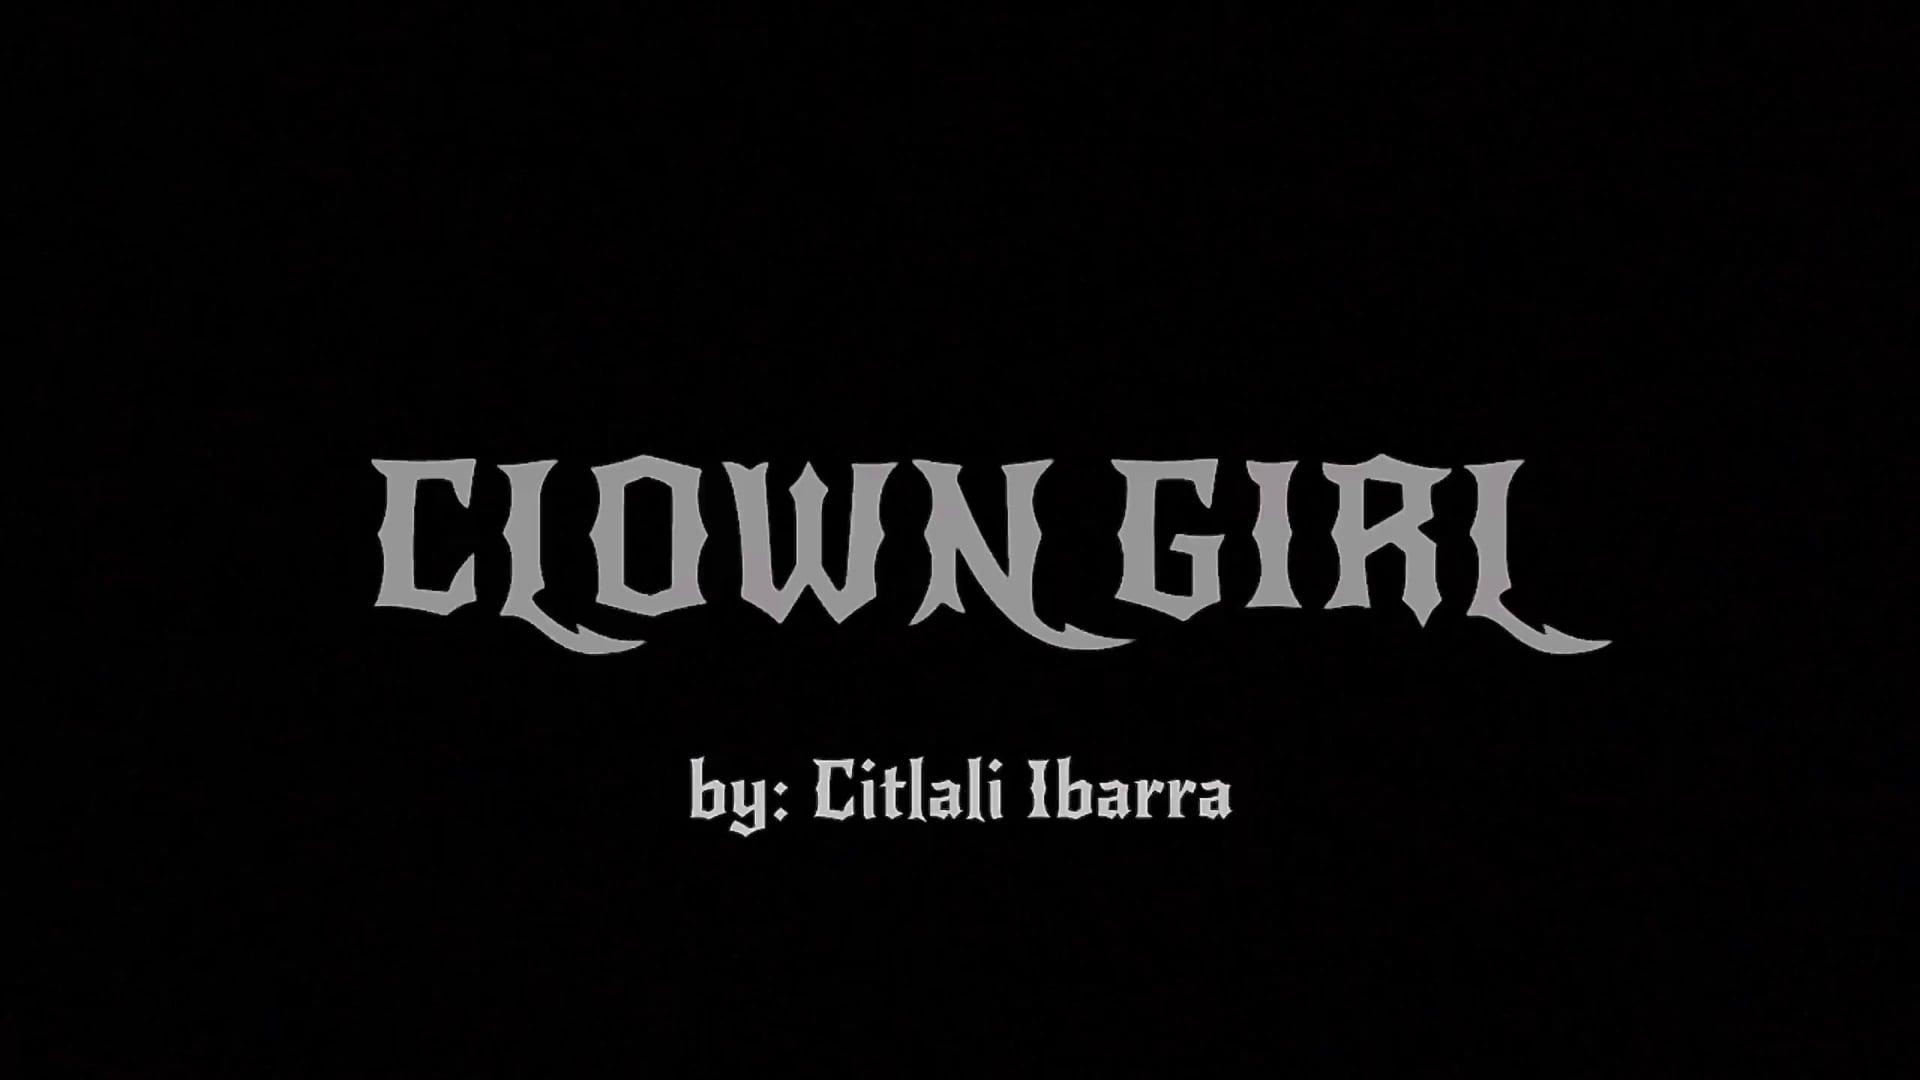 Citlali Ibarra_Clown Girl